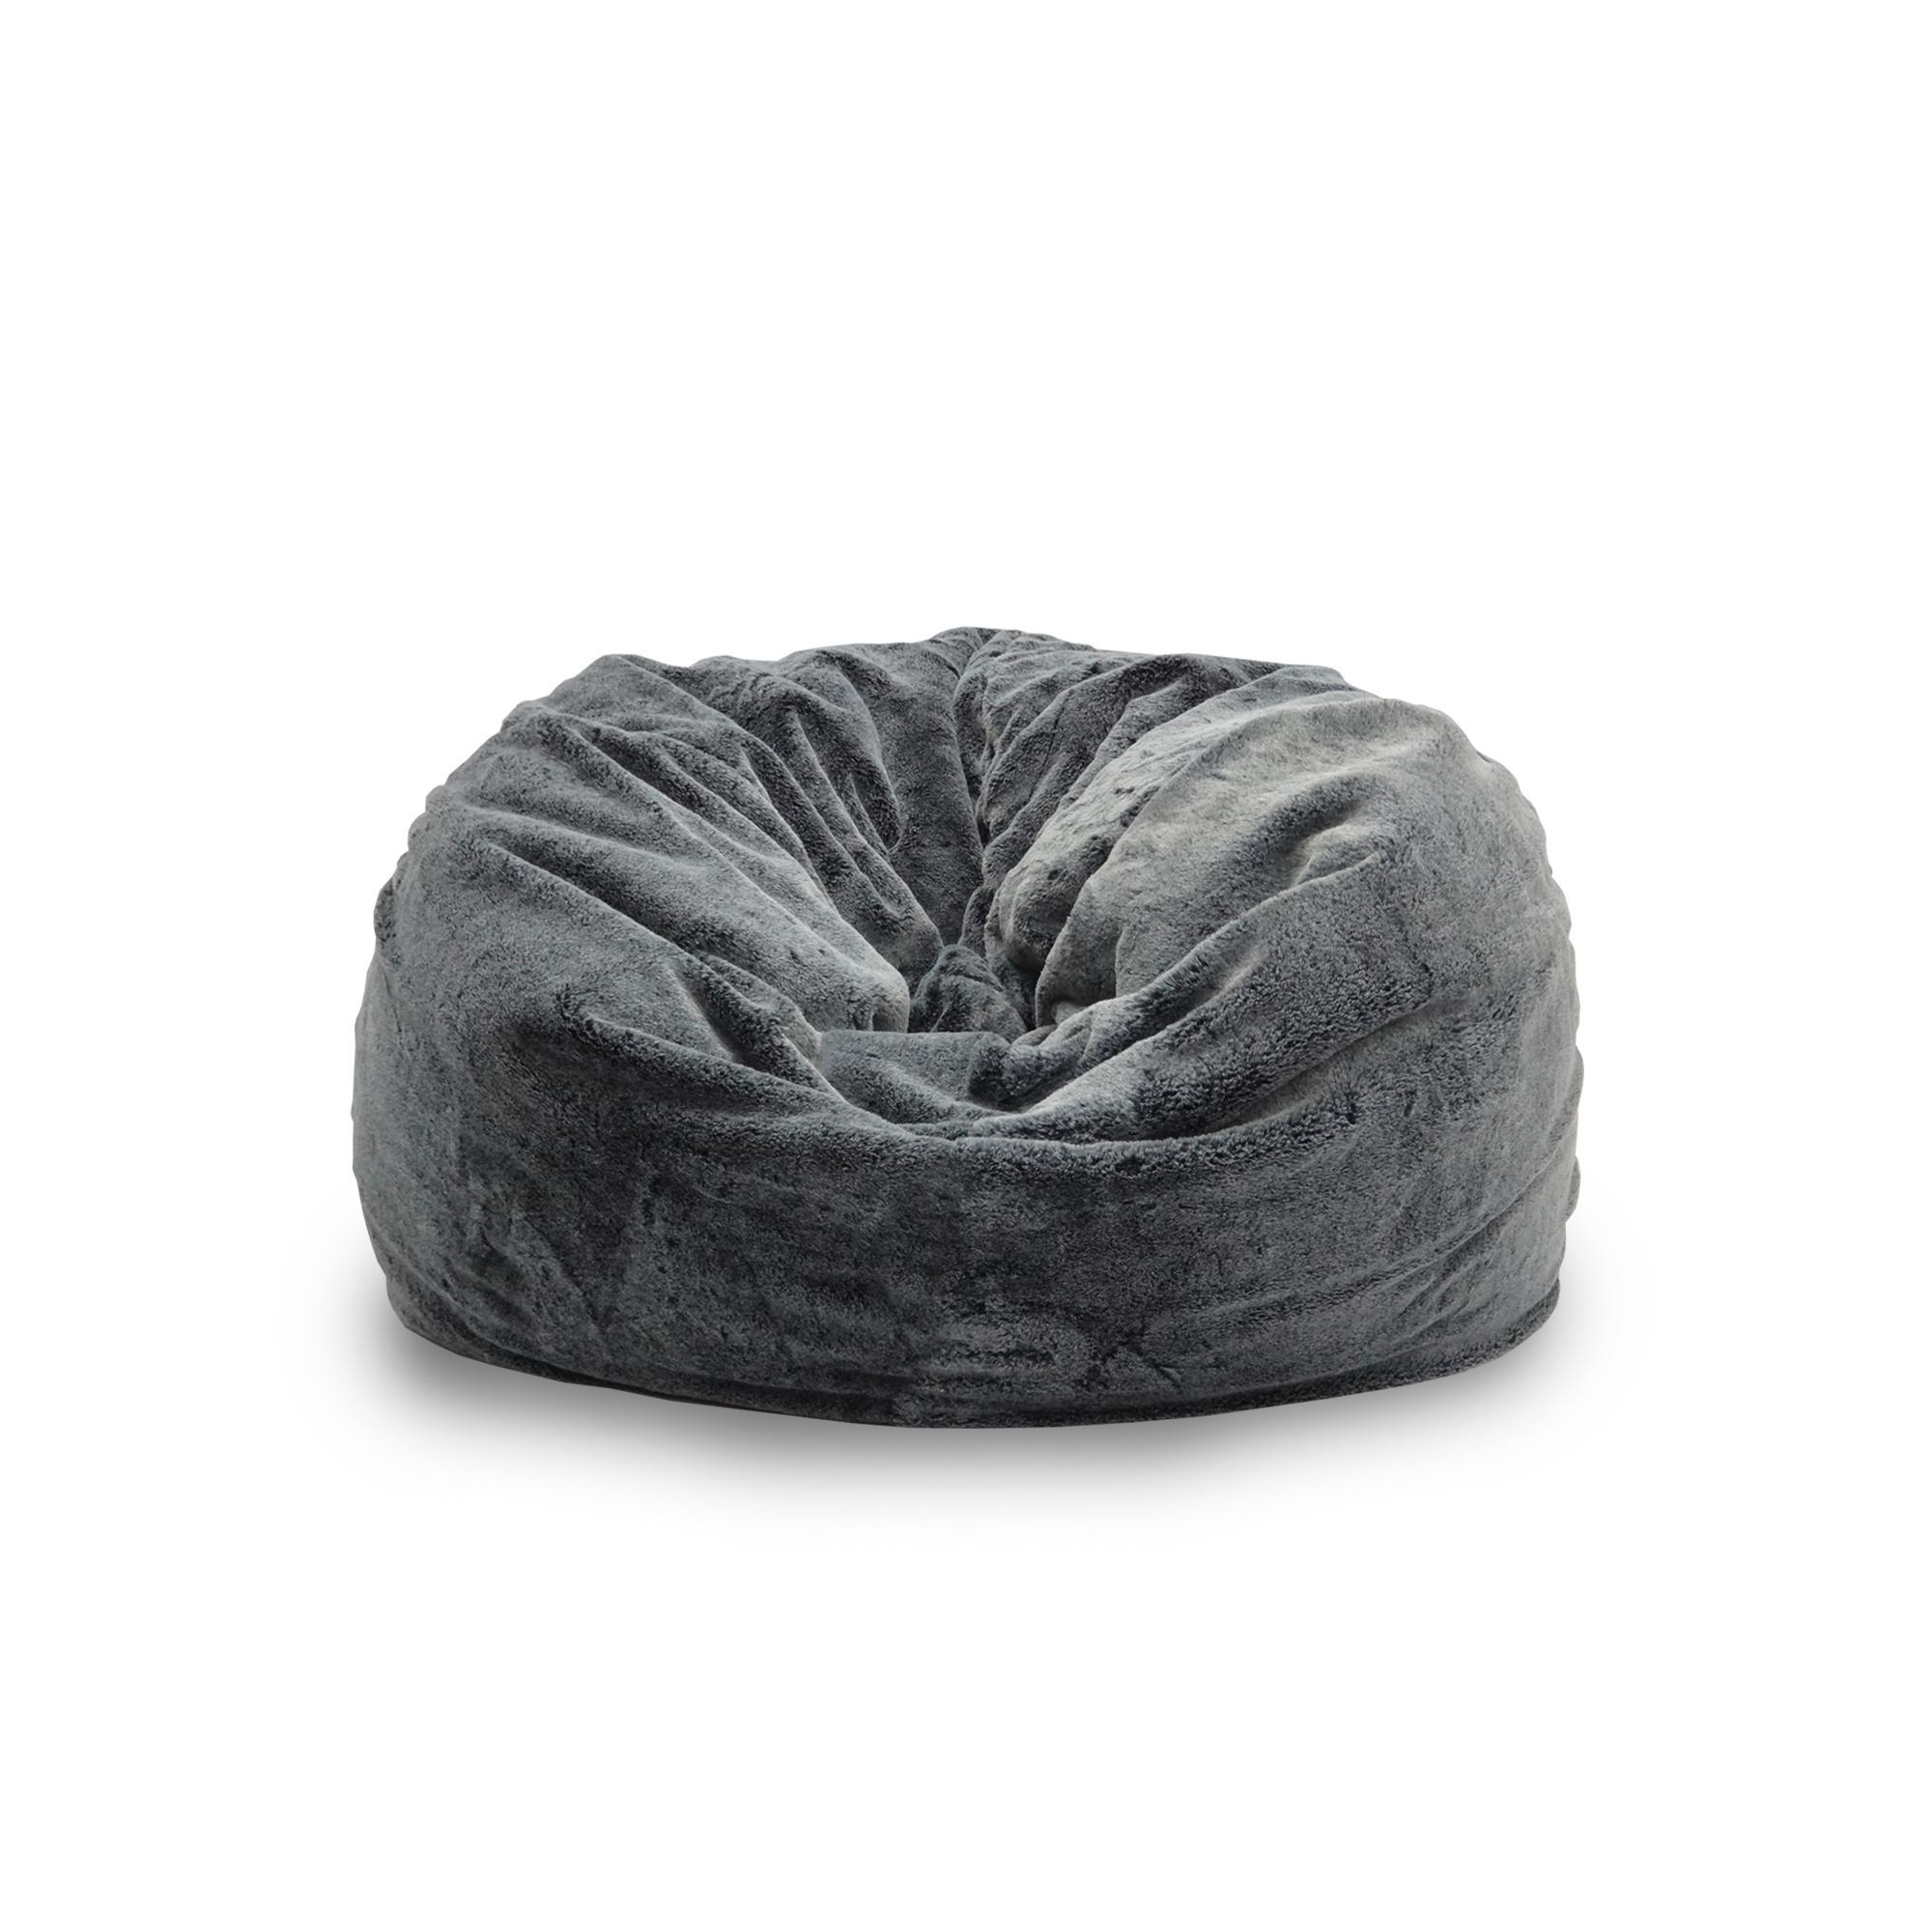 Achelous Premium Bean Bag (Medium) – Charcoal Black